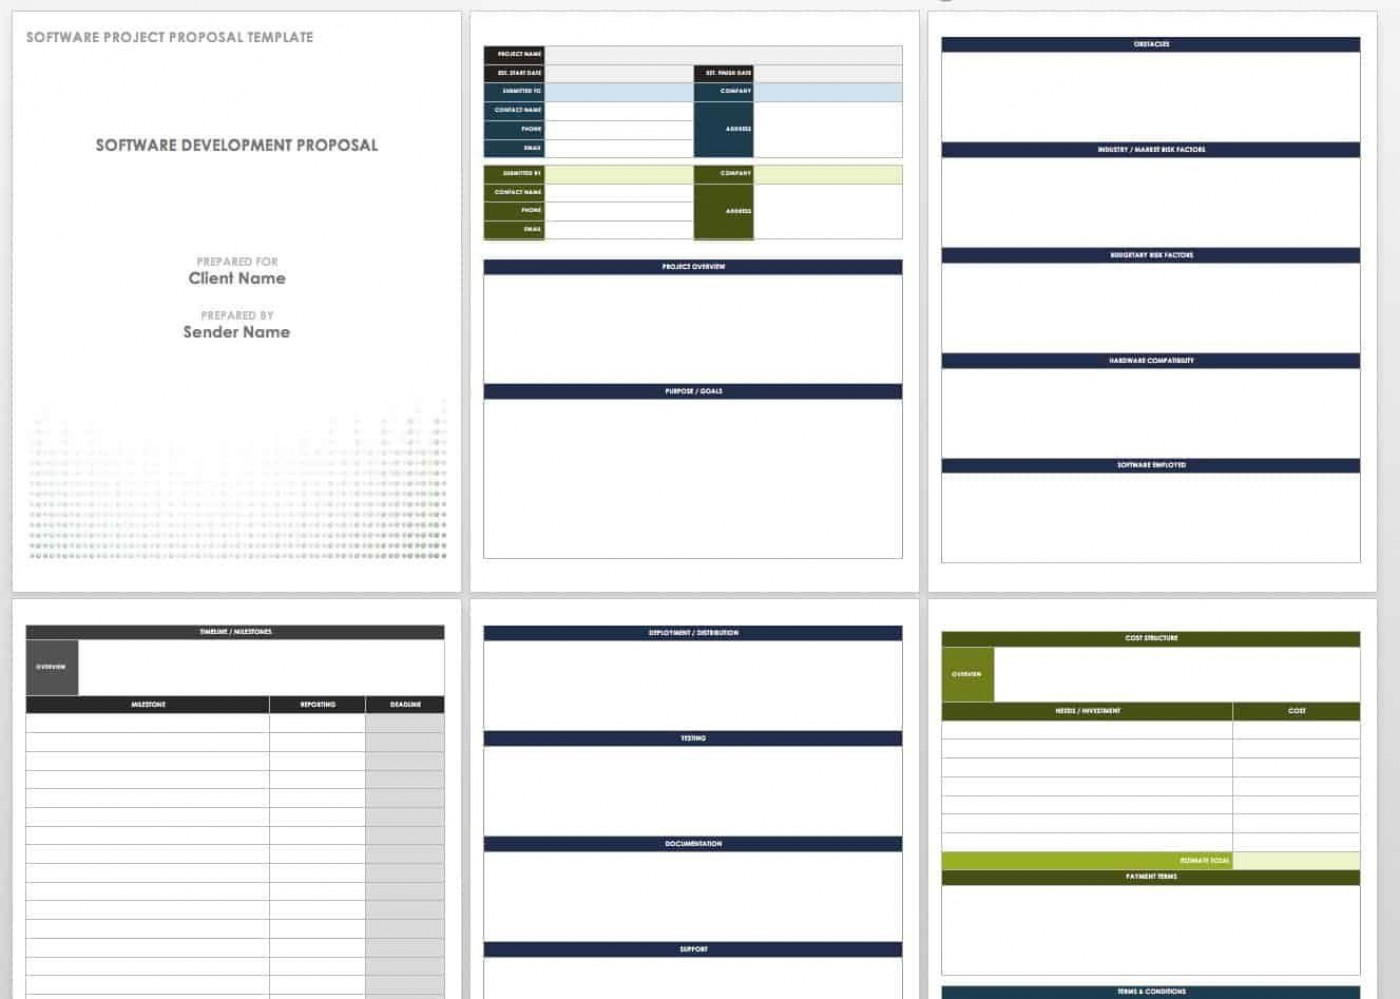 008 Stupendou Web Development Proposal Template Pdf Design  Sample1400